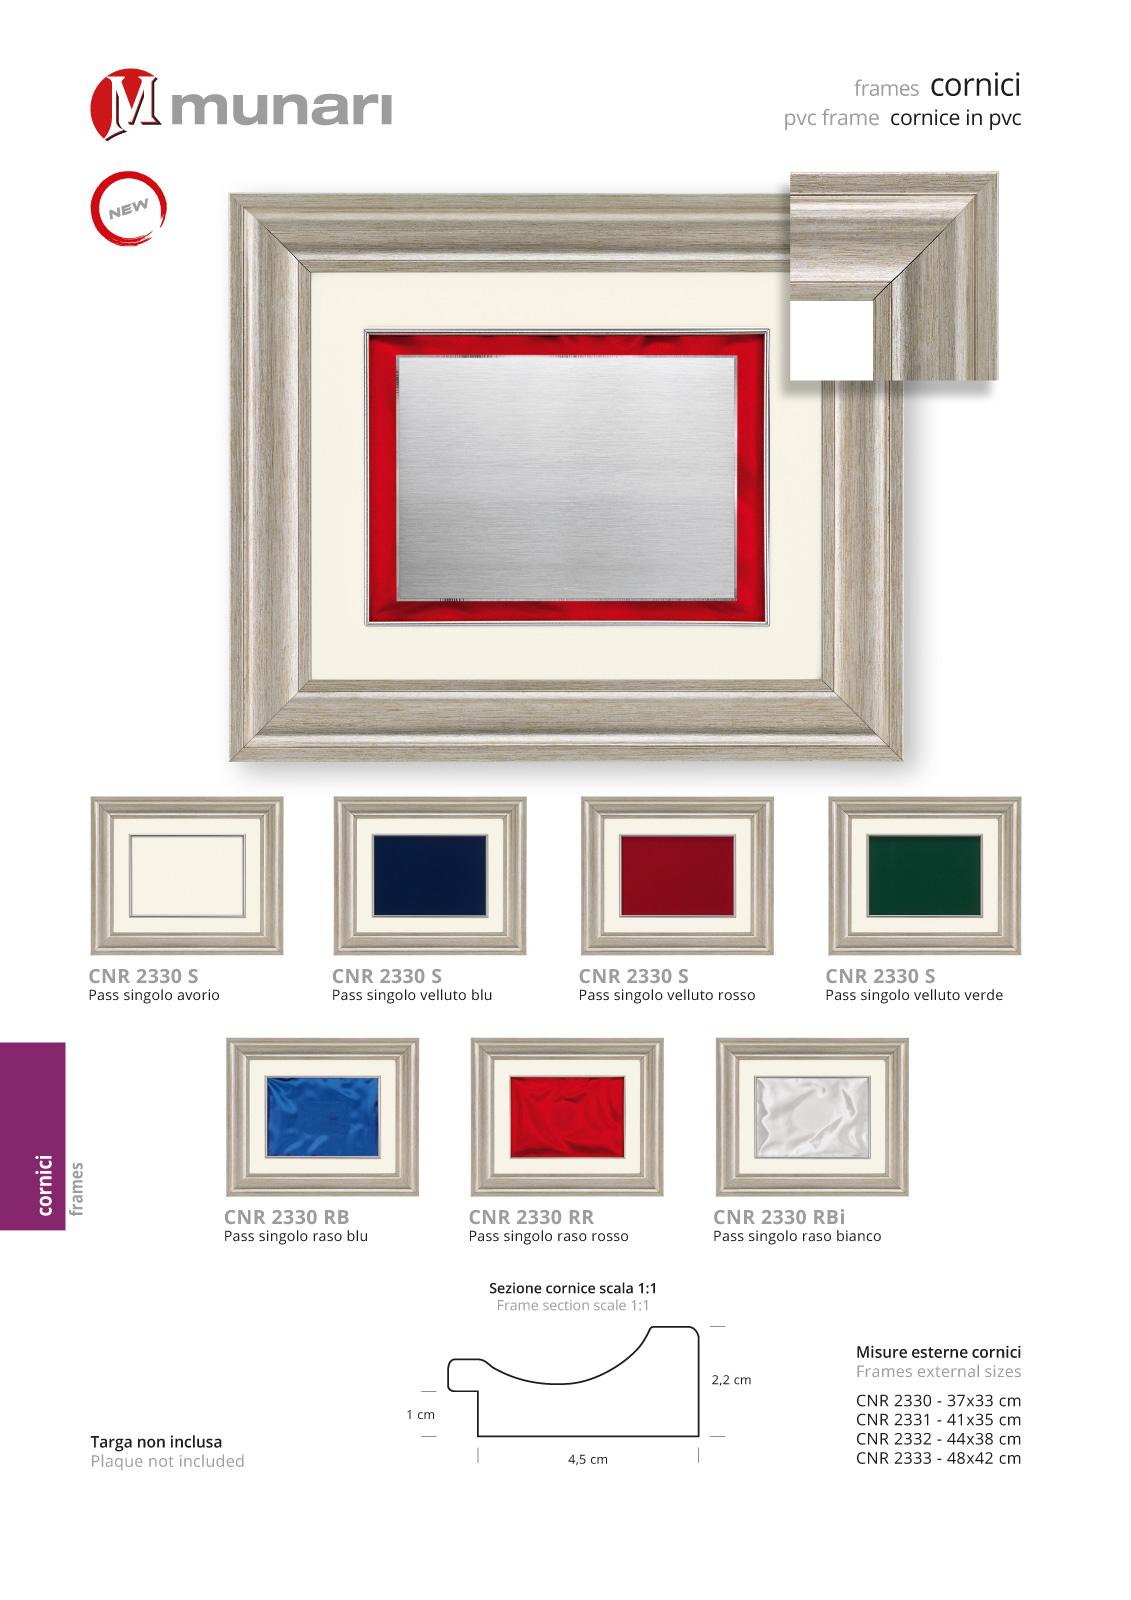 PVC frames series CNR 2330